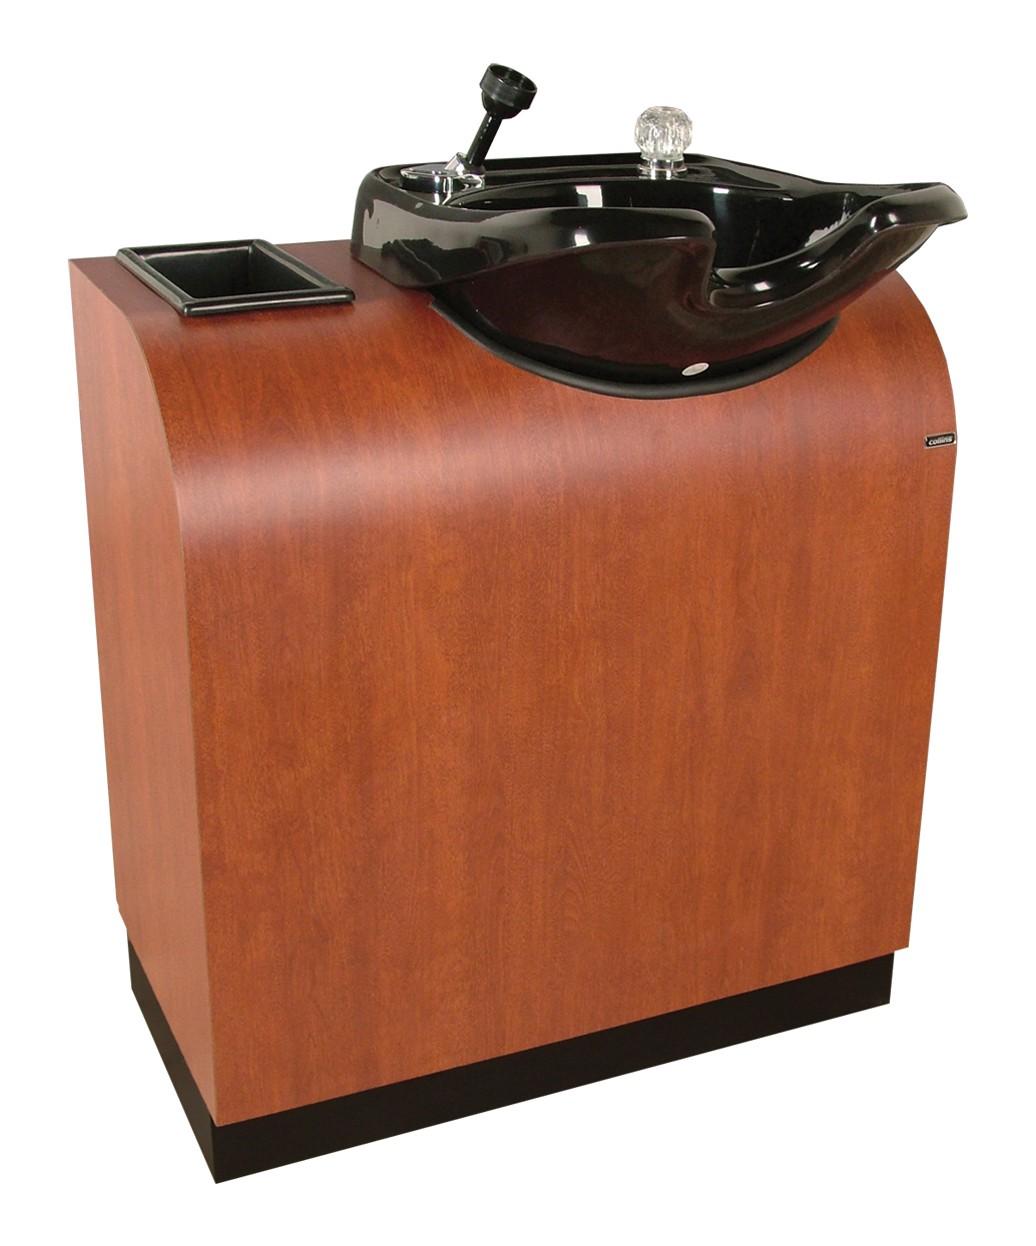 Collins QSE 5711-32 European Backwash Shampoo System w/ Bowl